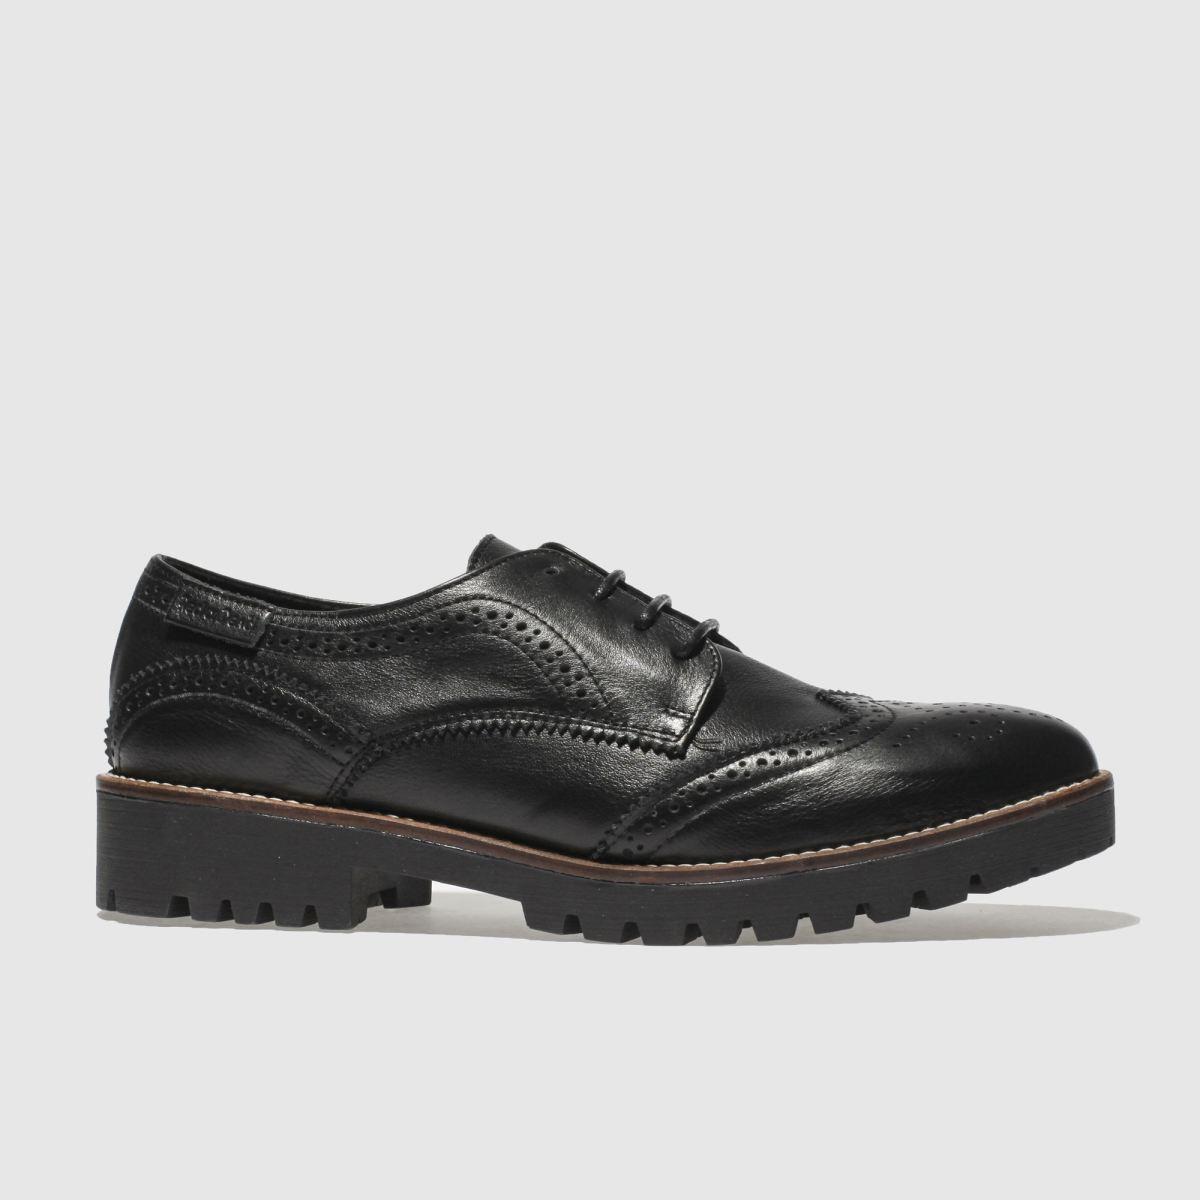 Red Or Dead Black Jam Tart Flat Shoes